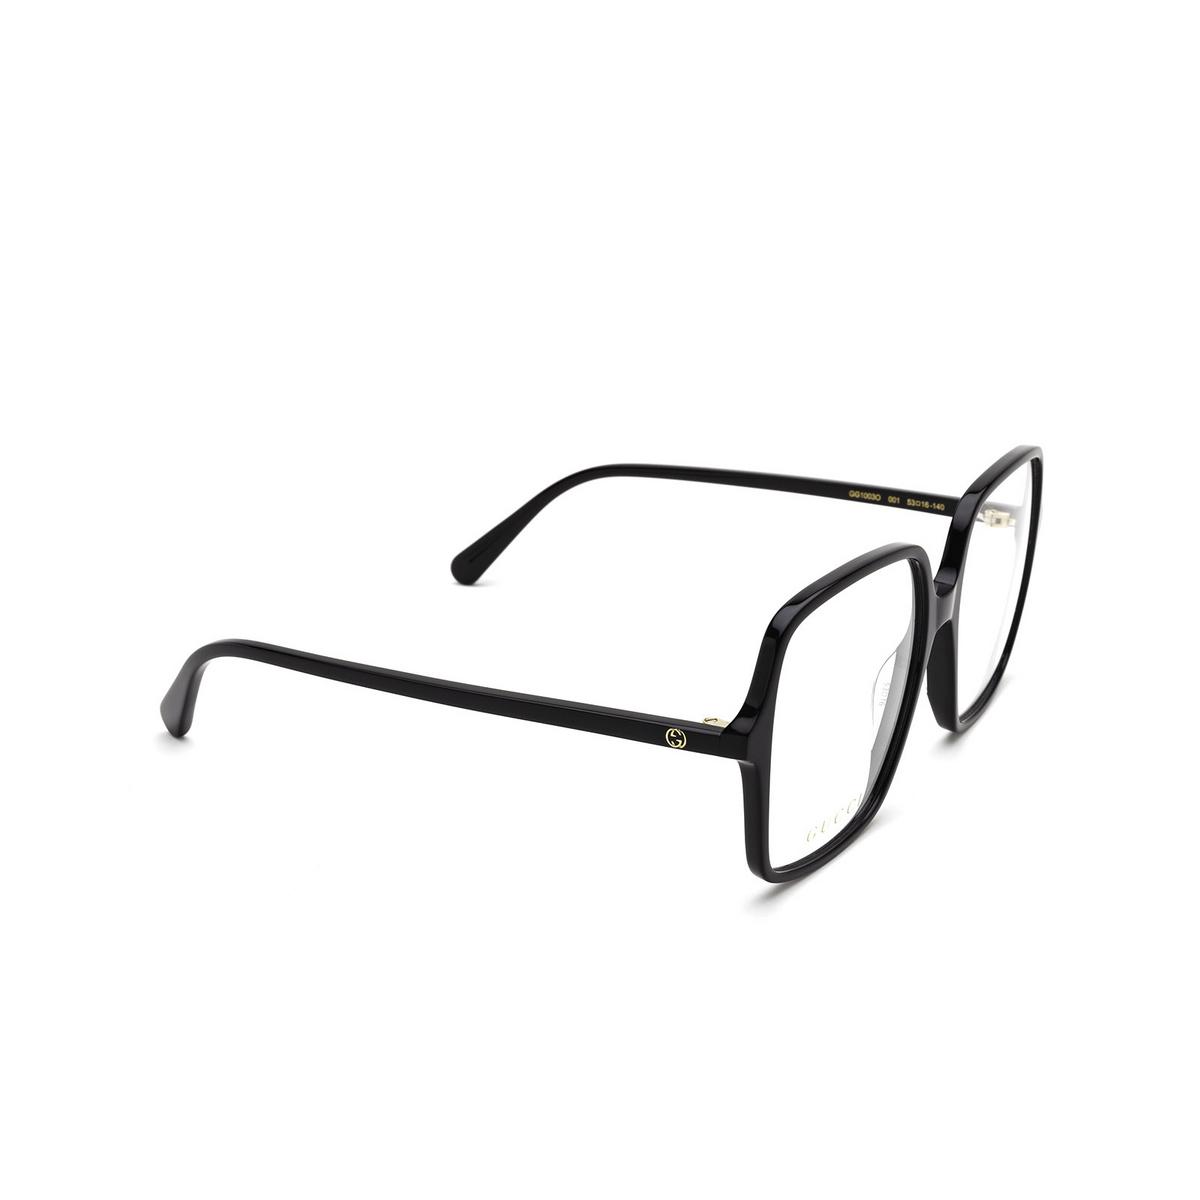 Gucci® Square Eyeglasses: GG1003O color Black 001 - three-quarters view.